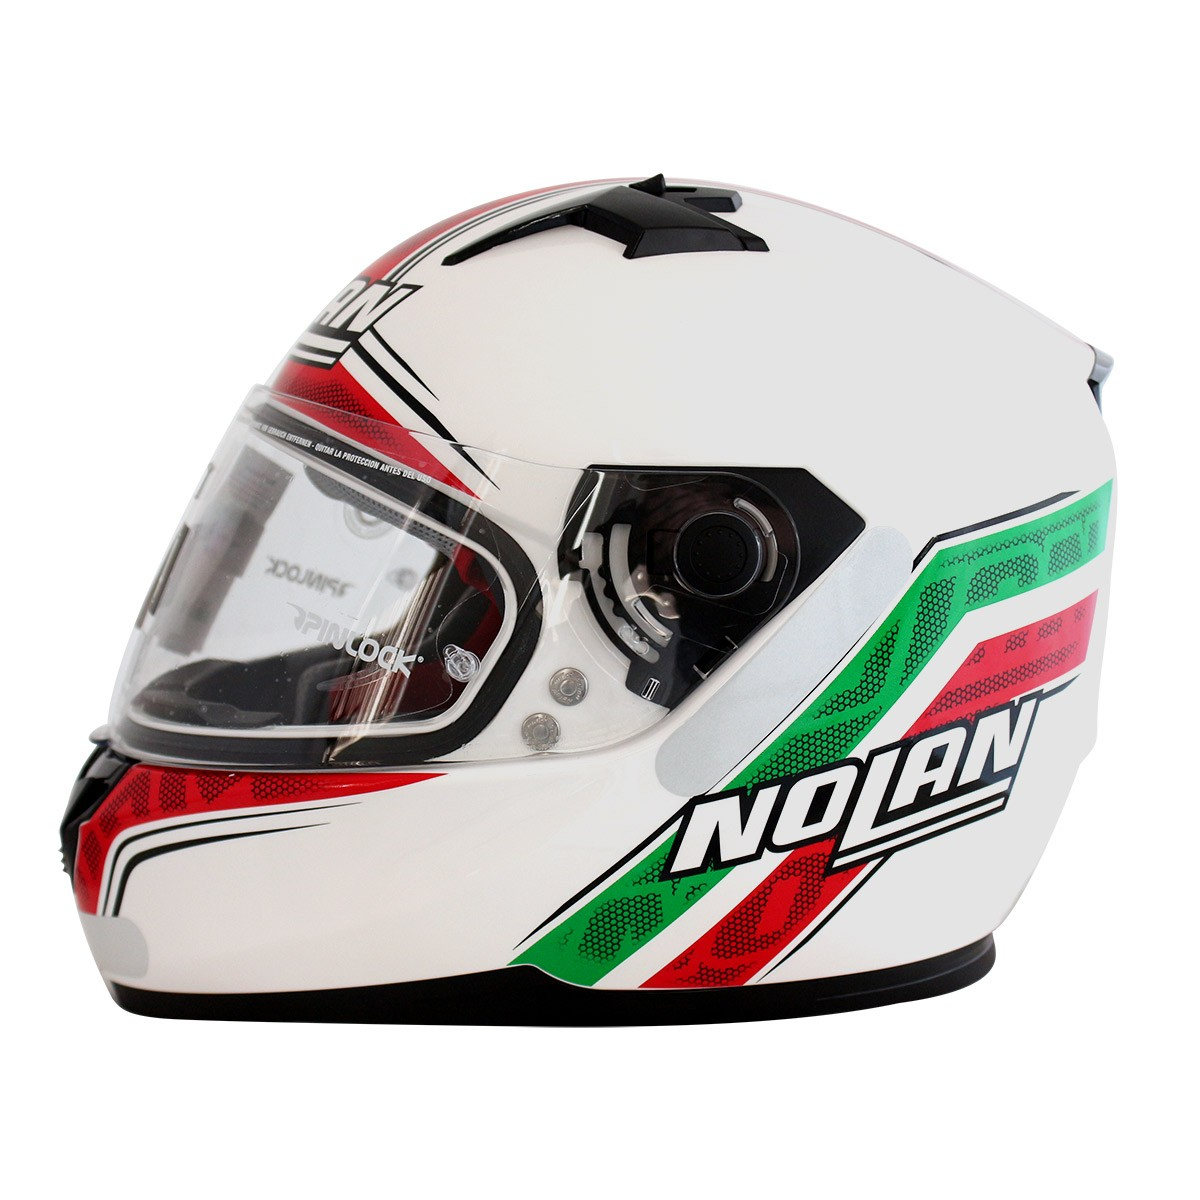 Capacete Nolan N64 Italy Metal White - Ganhe Touca Balaclava  - Nova Suzuki Motos e Acessórios